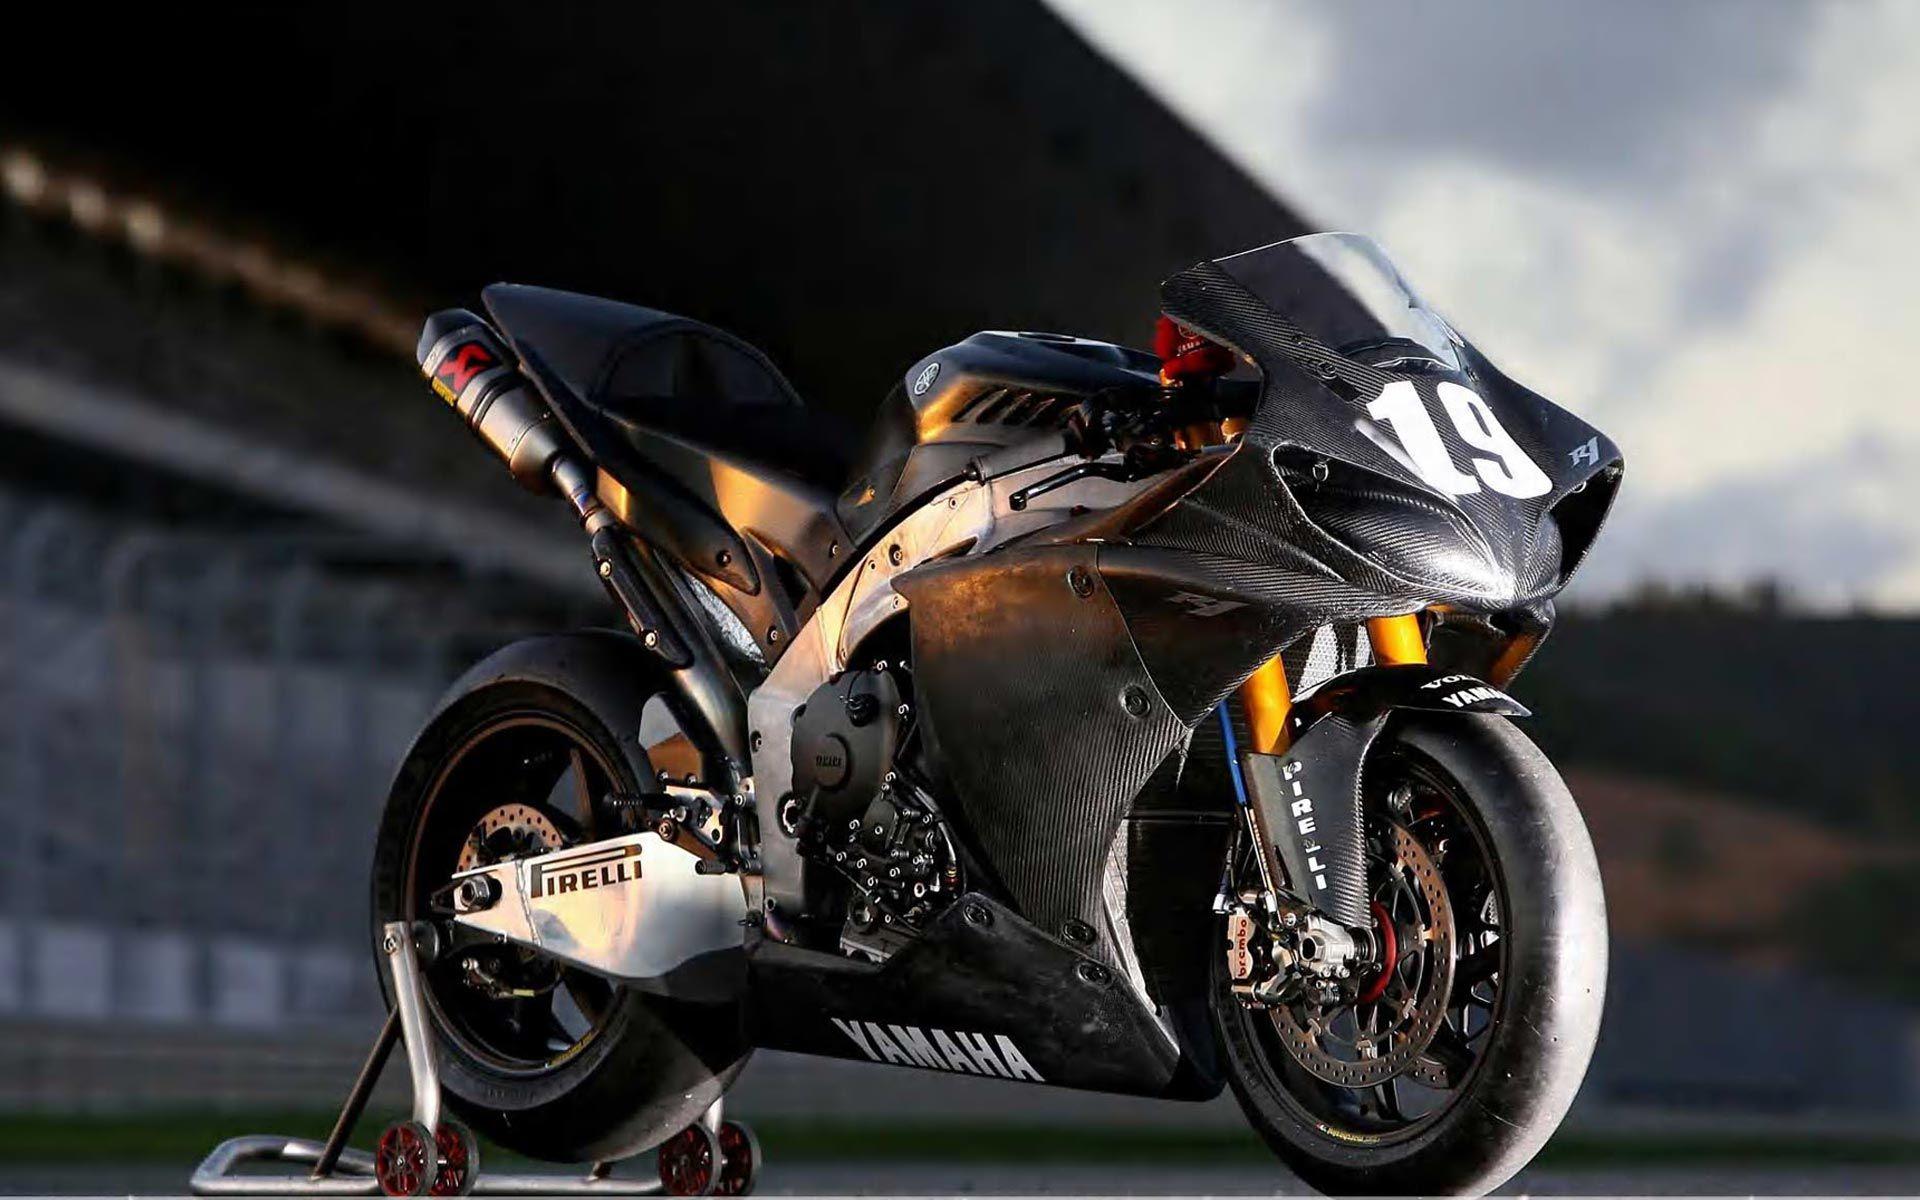 Hd background yamaha yzf r1 sport bike black and gold wallpaper - Yamaha R1 Wallpapers Wallpaper Cave